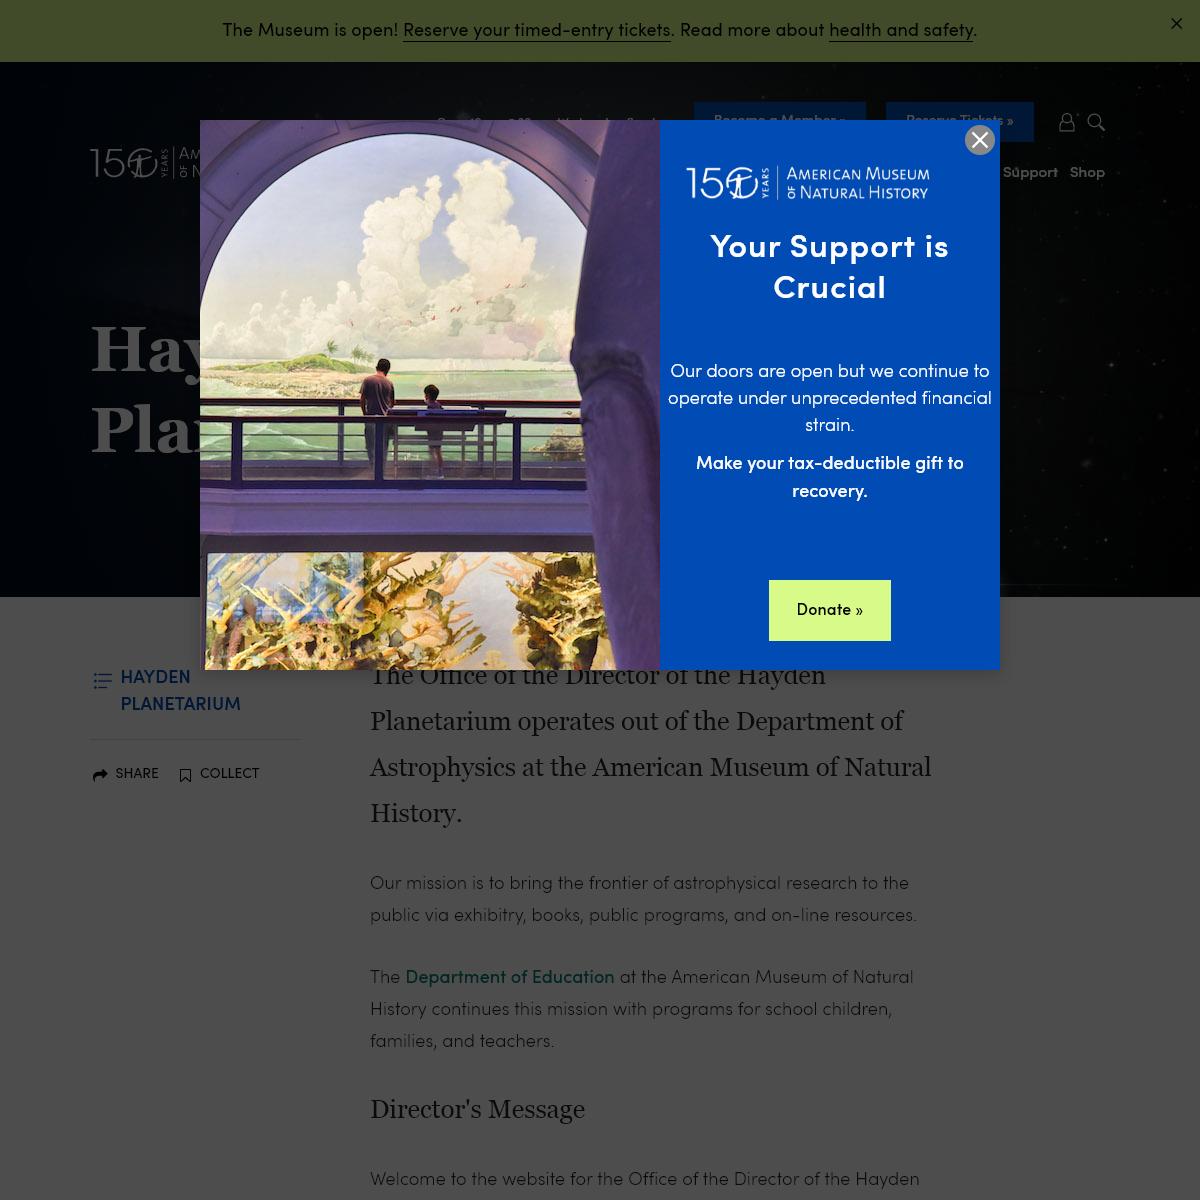 Hayden Planetarium- Astrophysics Brought to Life - AMNH